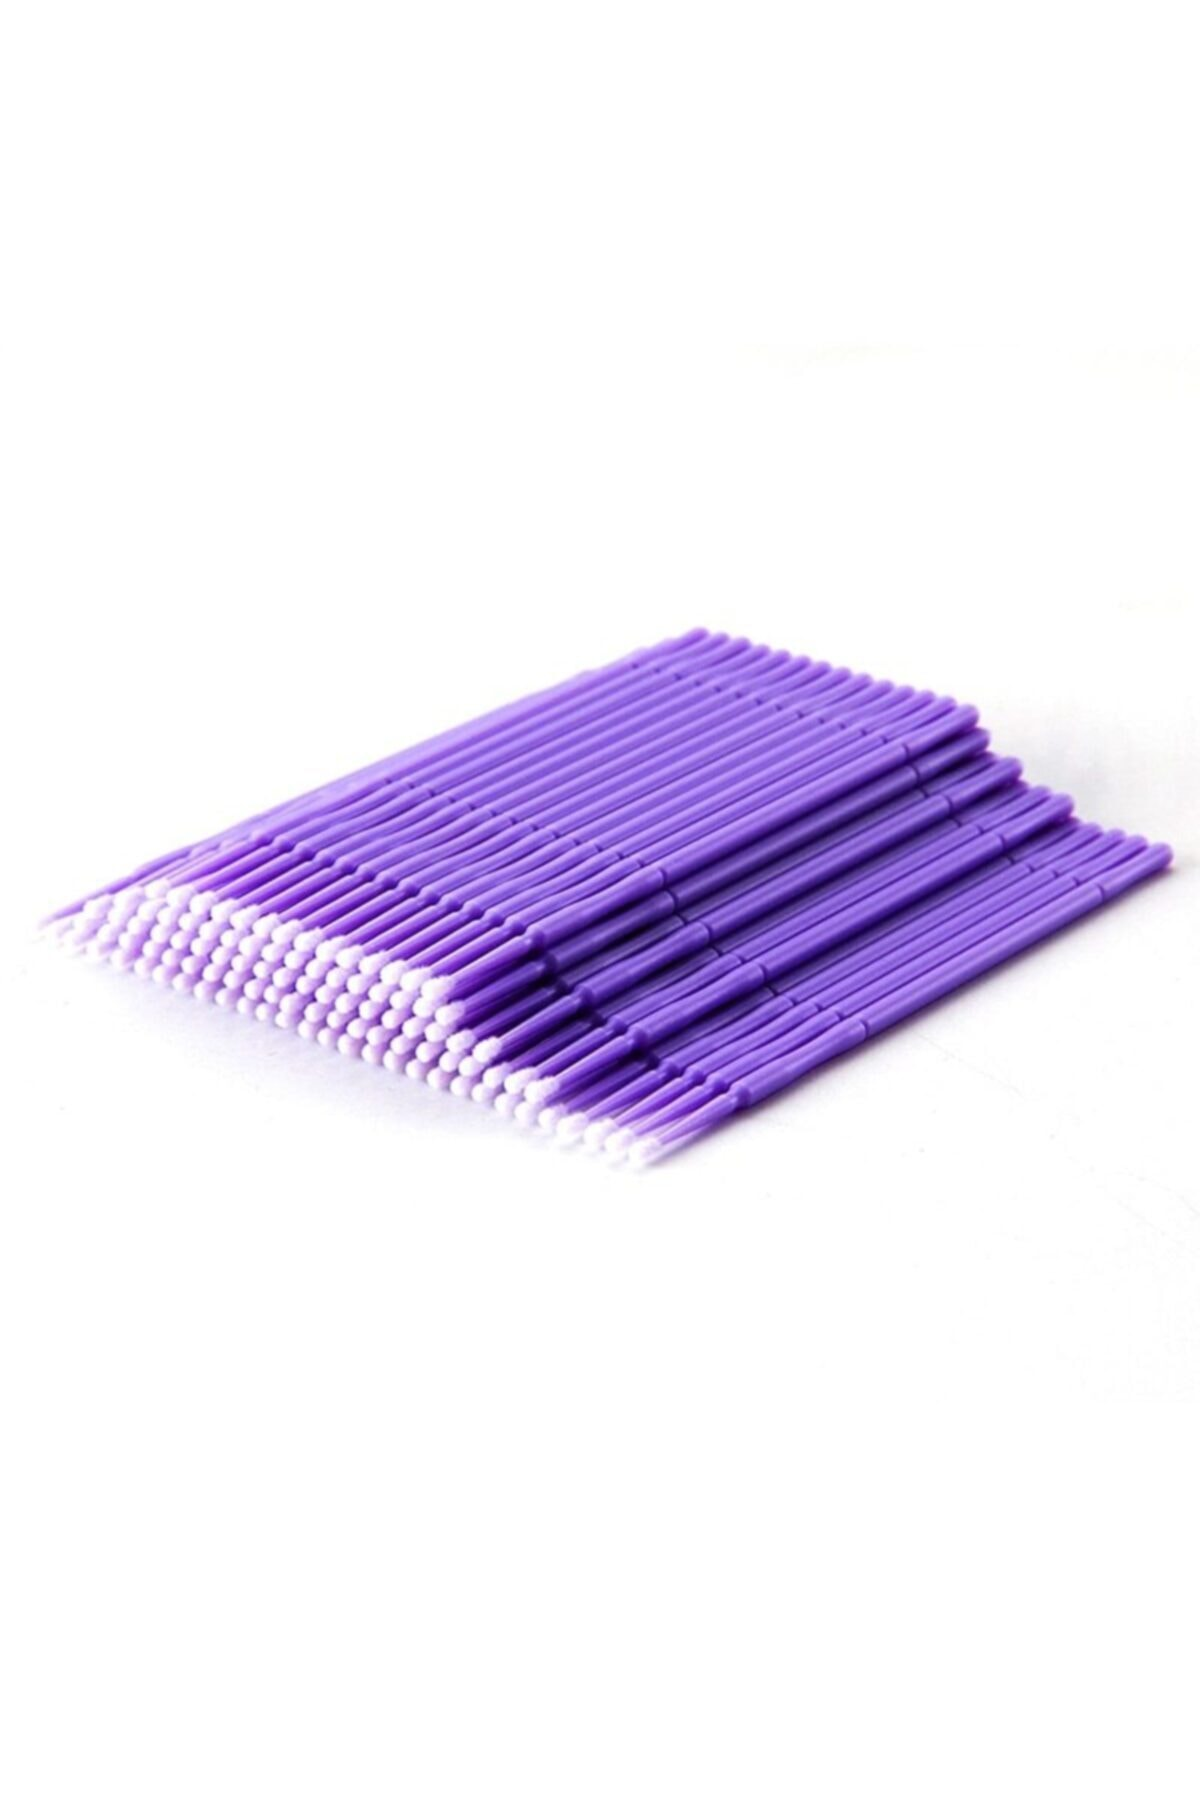 NAGARAKU Microbrush Fırça 100'lü 1